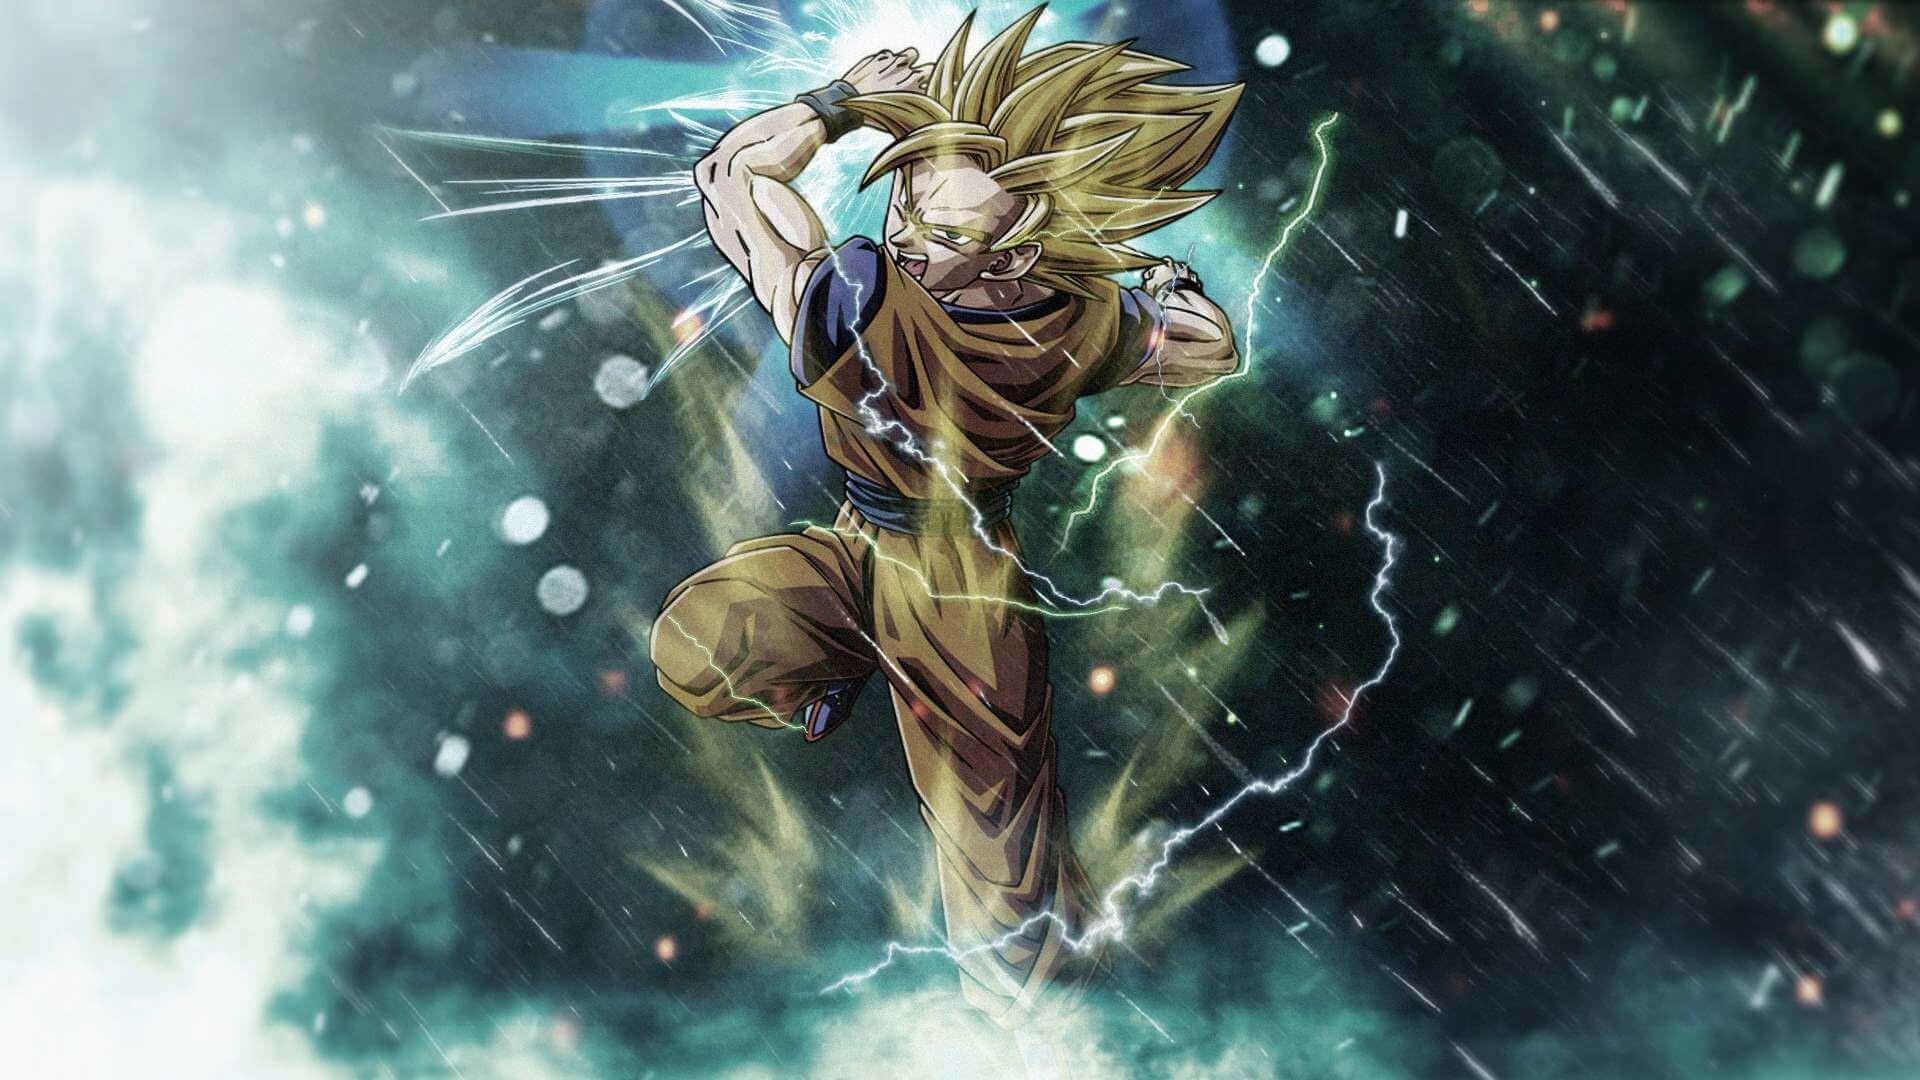 Goku Wallpapers HD 65+ images